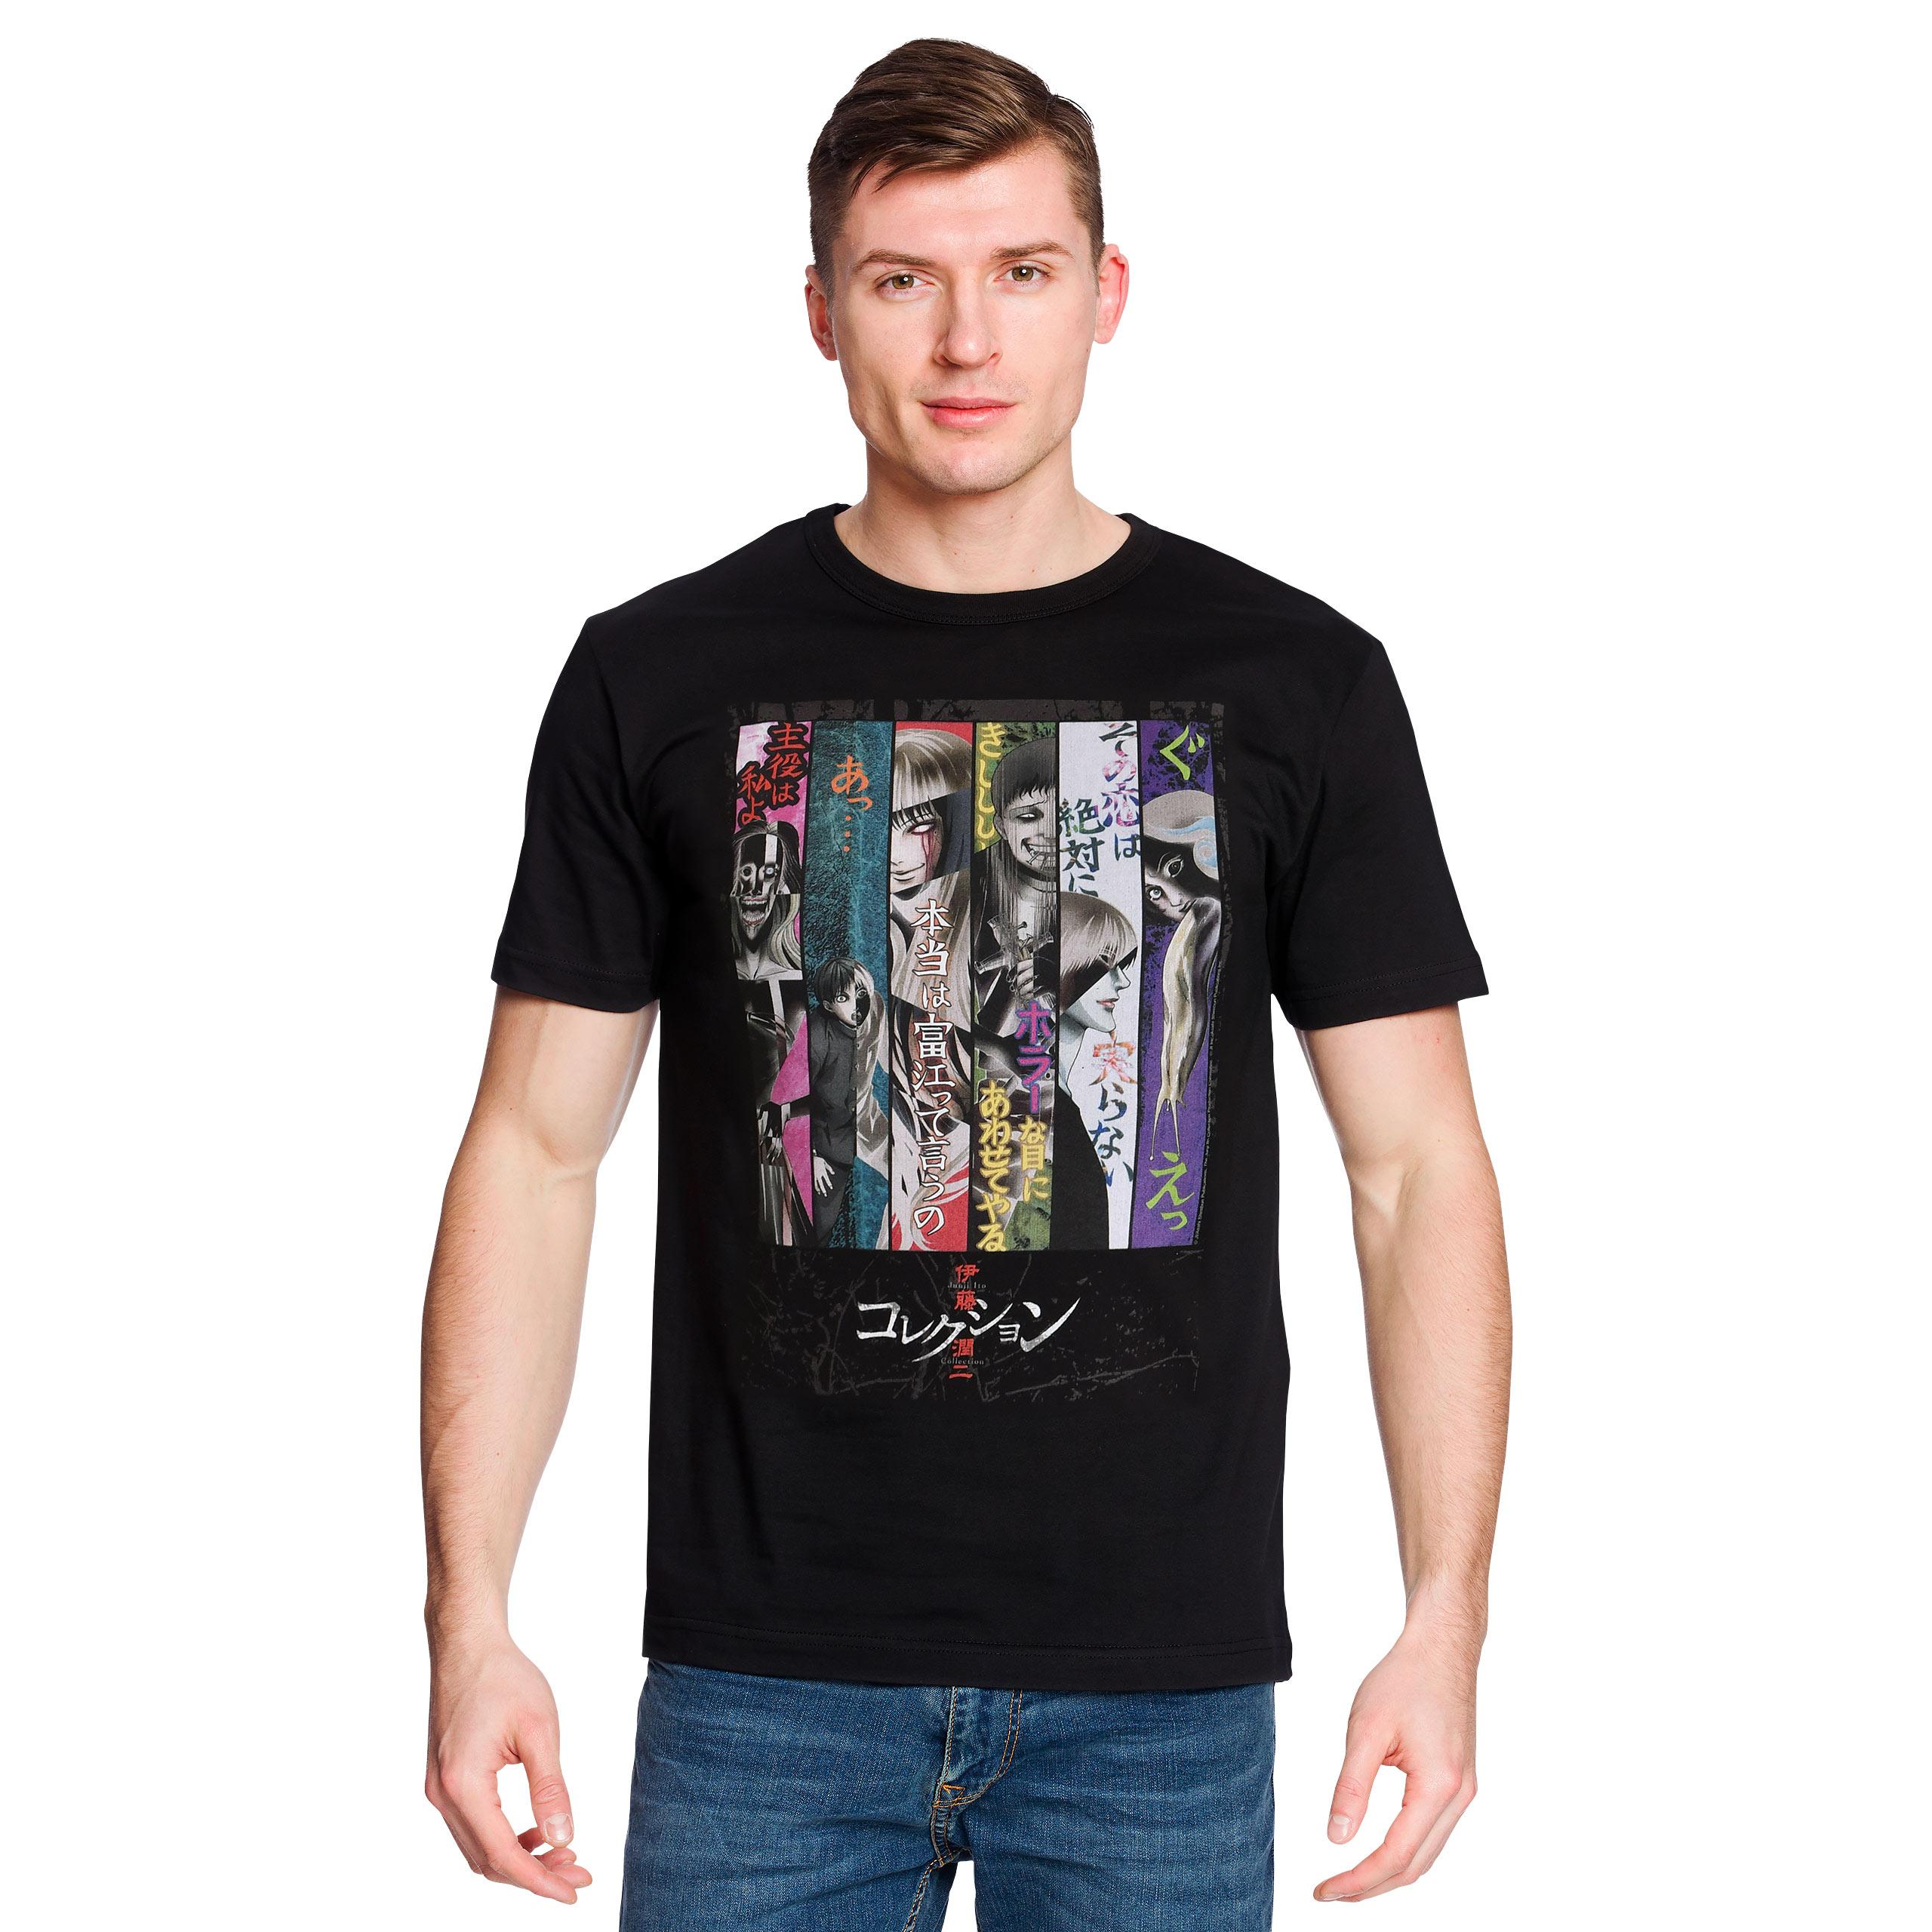 Junji Ito - Key Art T-Shirt schwarz